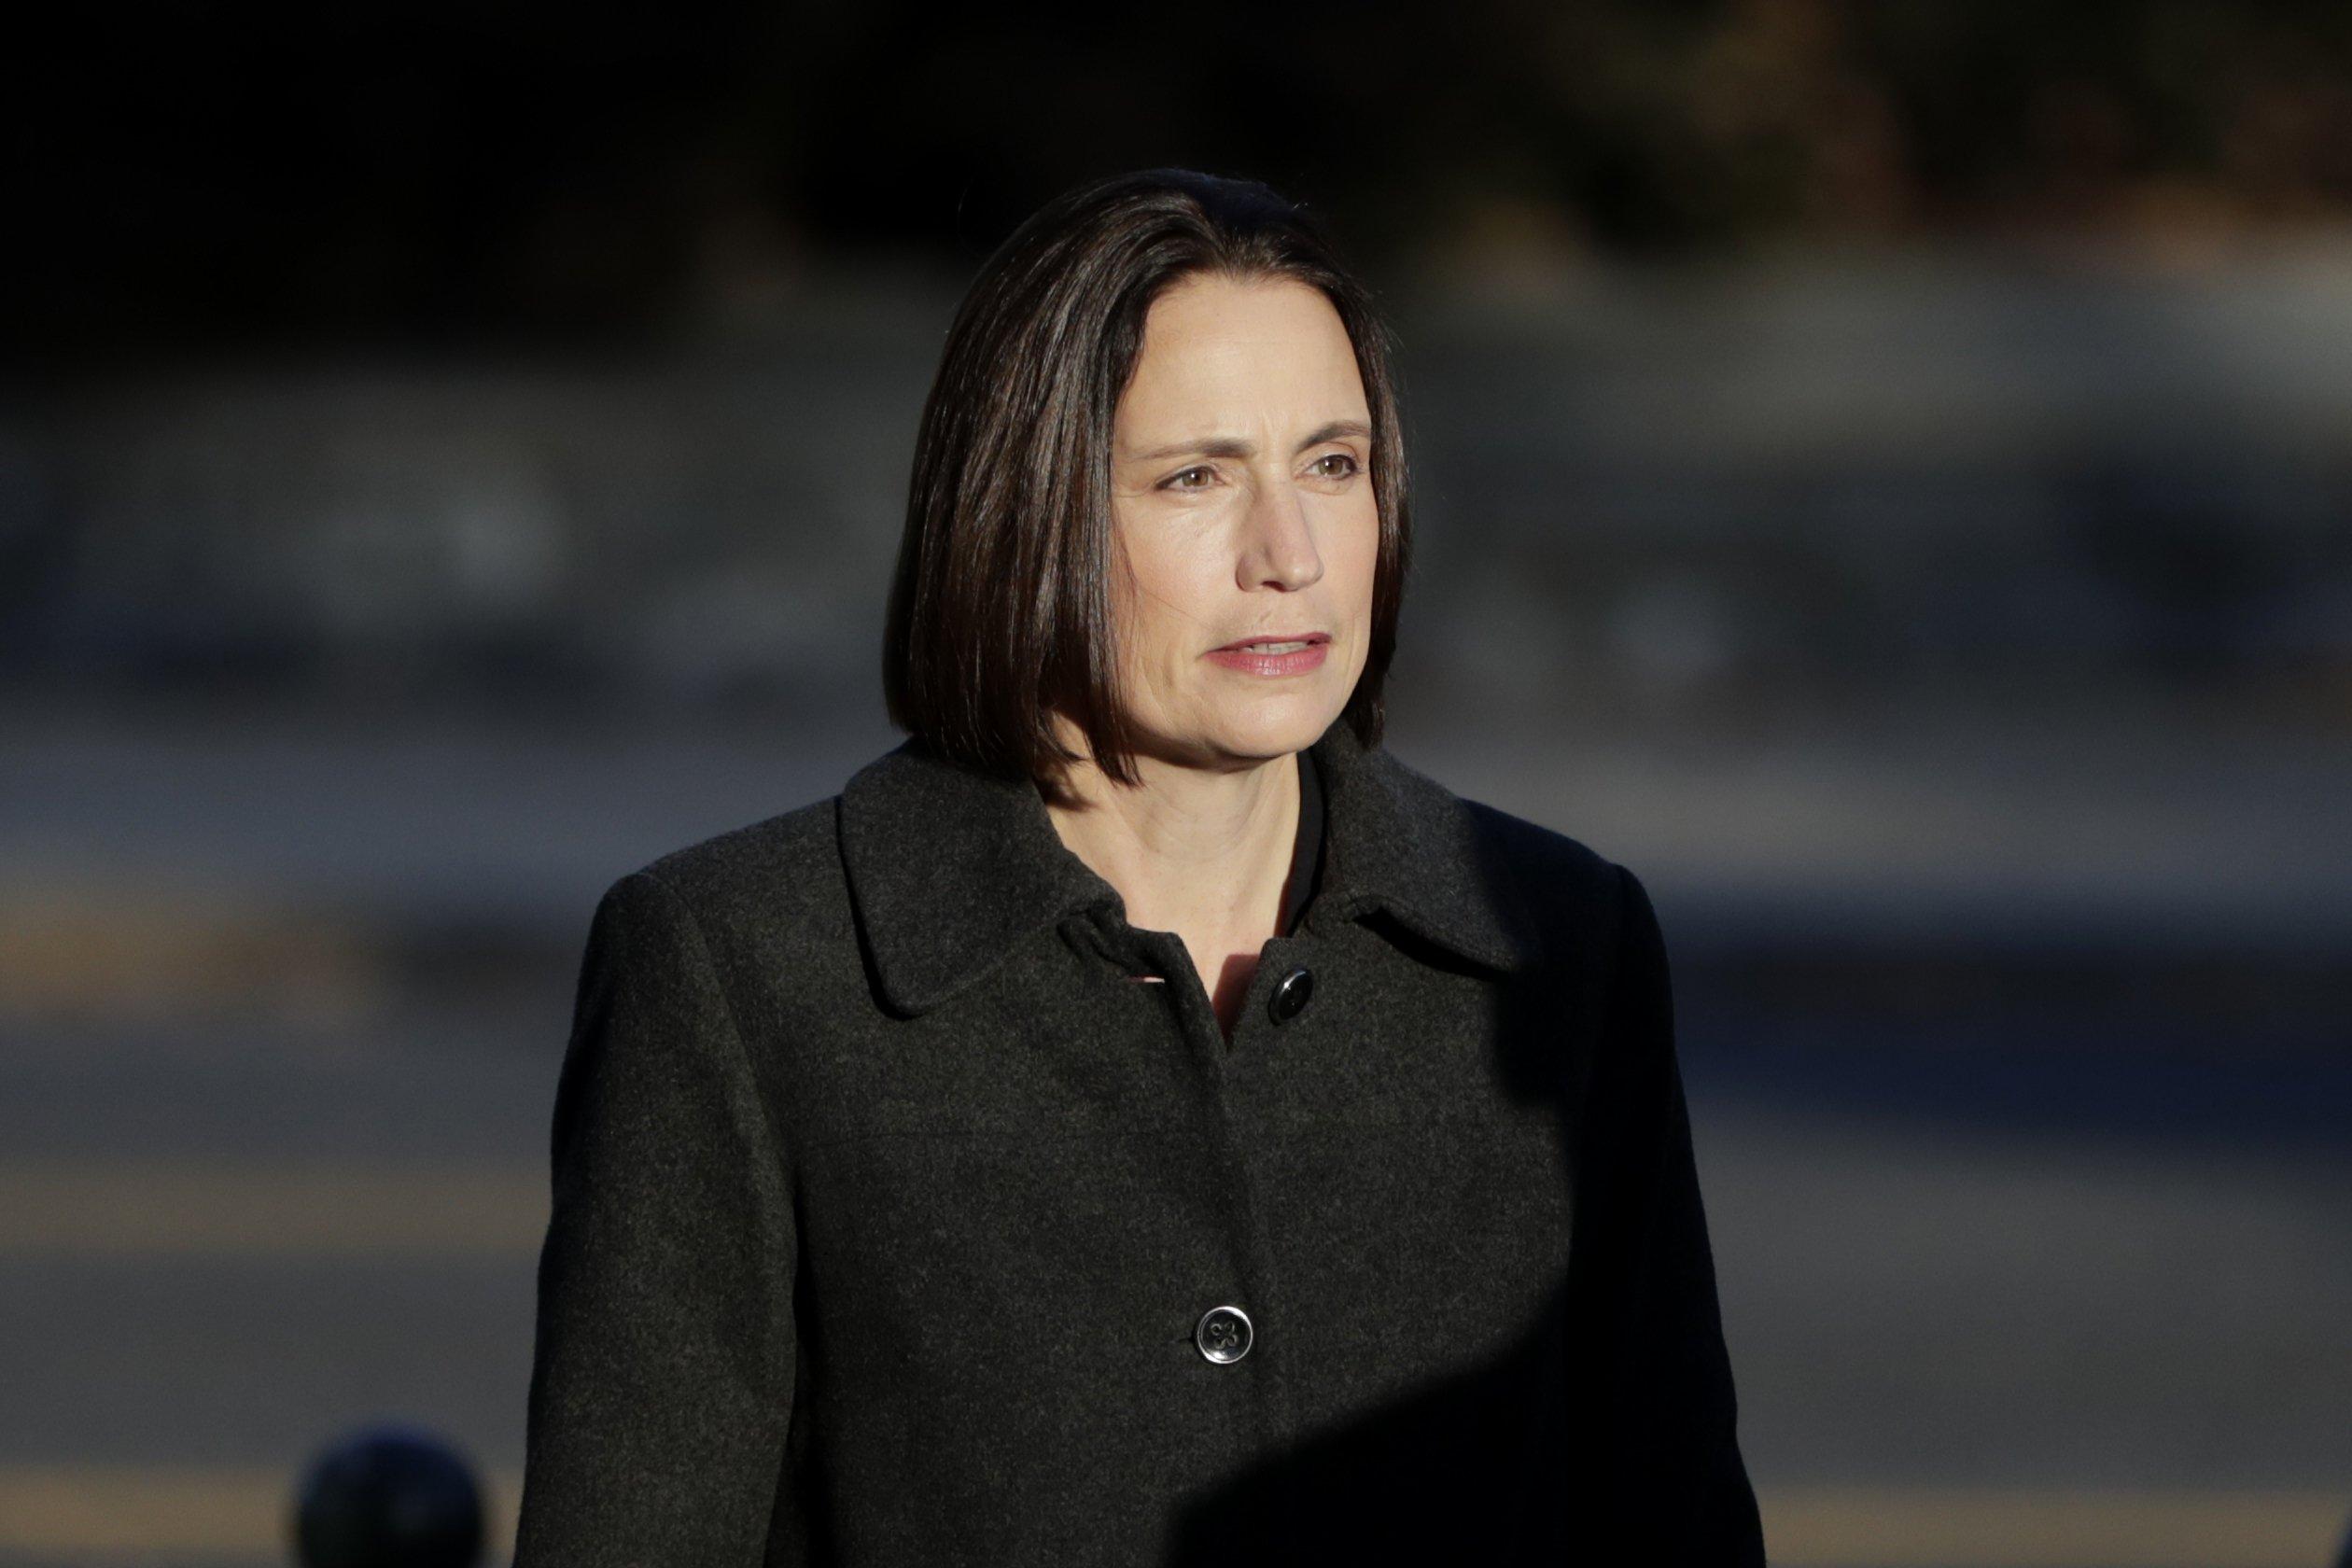 <b>Impeachment inquiry: Fiona Hill's testimony</b>